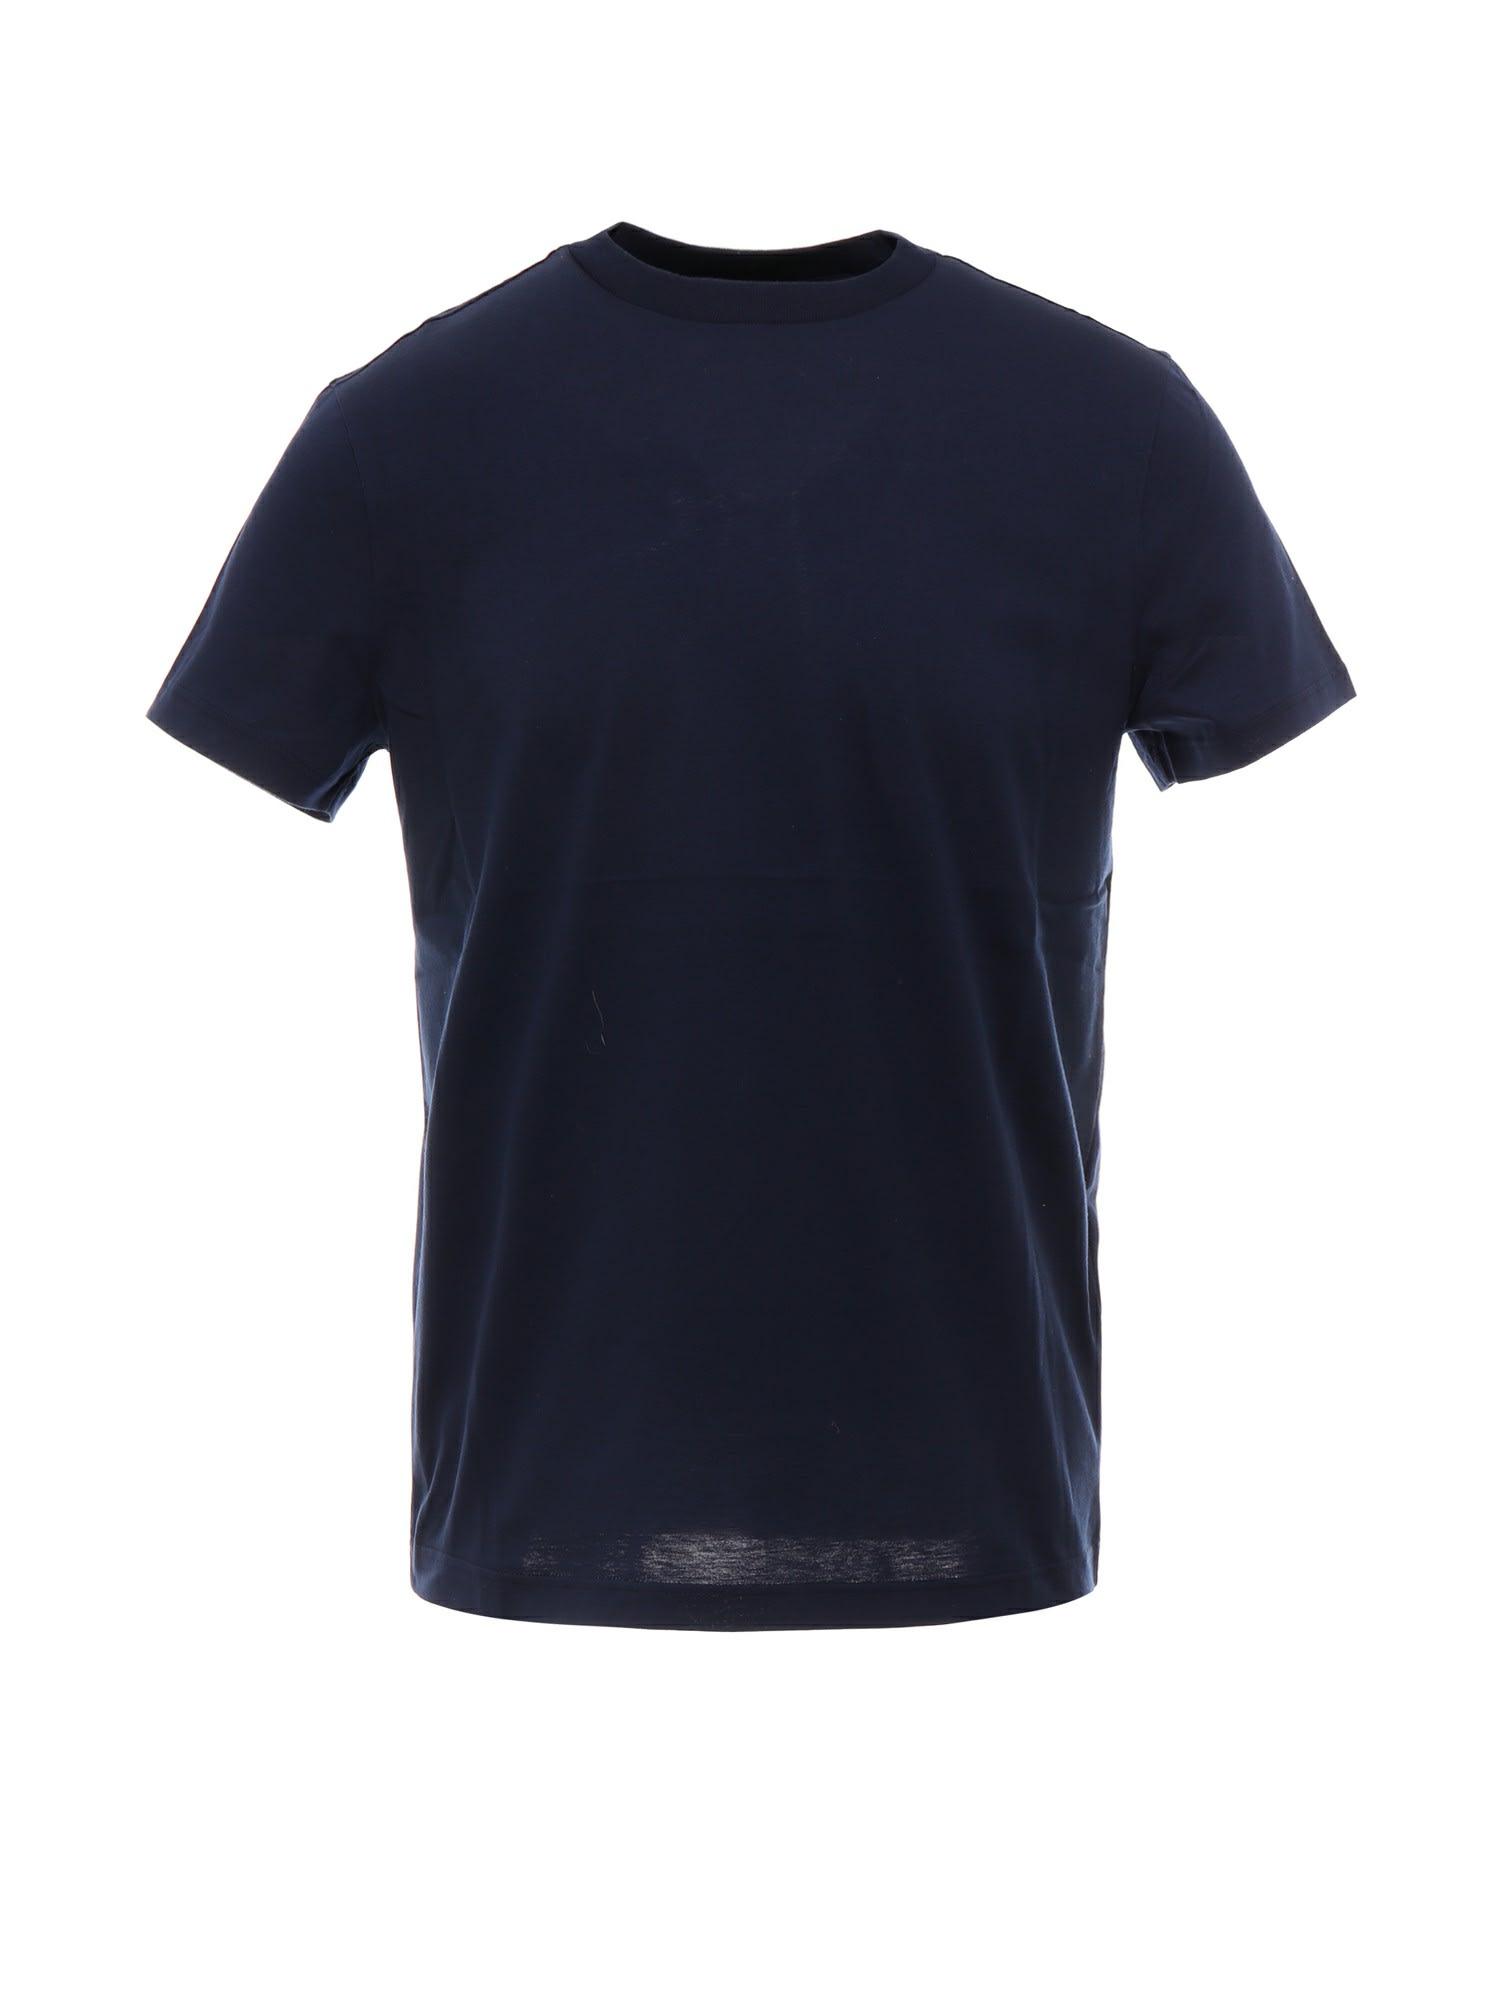 Prada Obvious Classic T-shirt